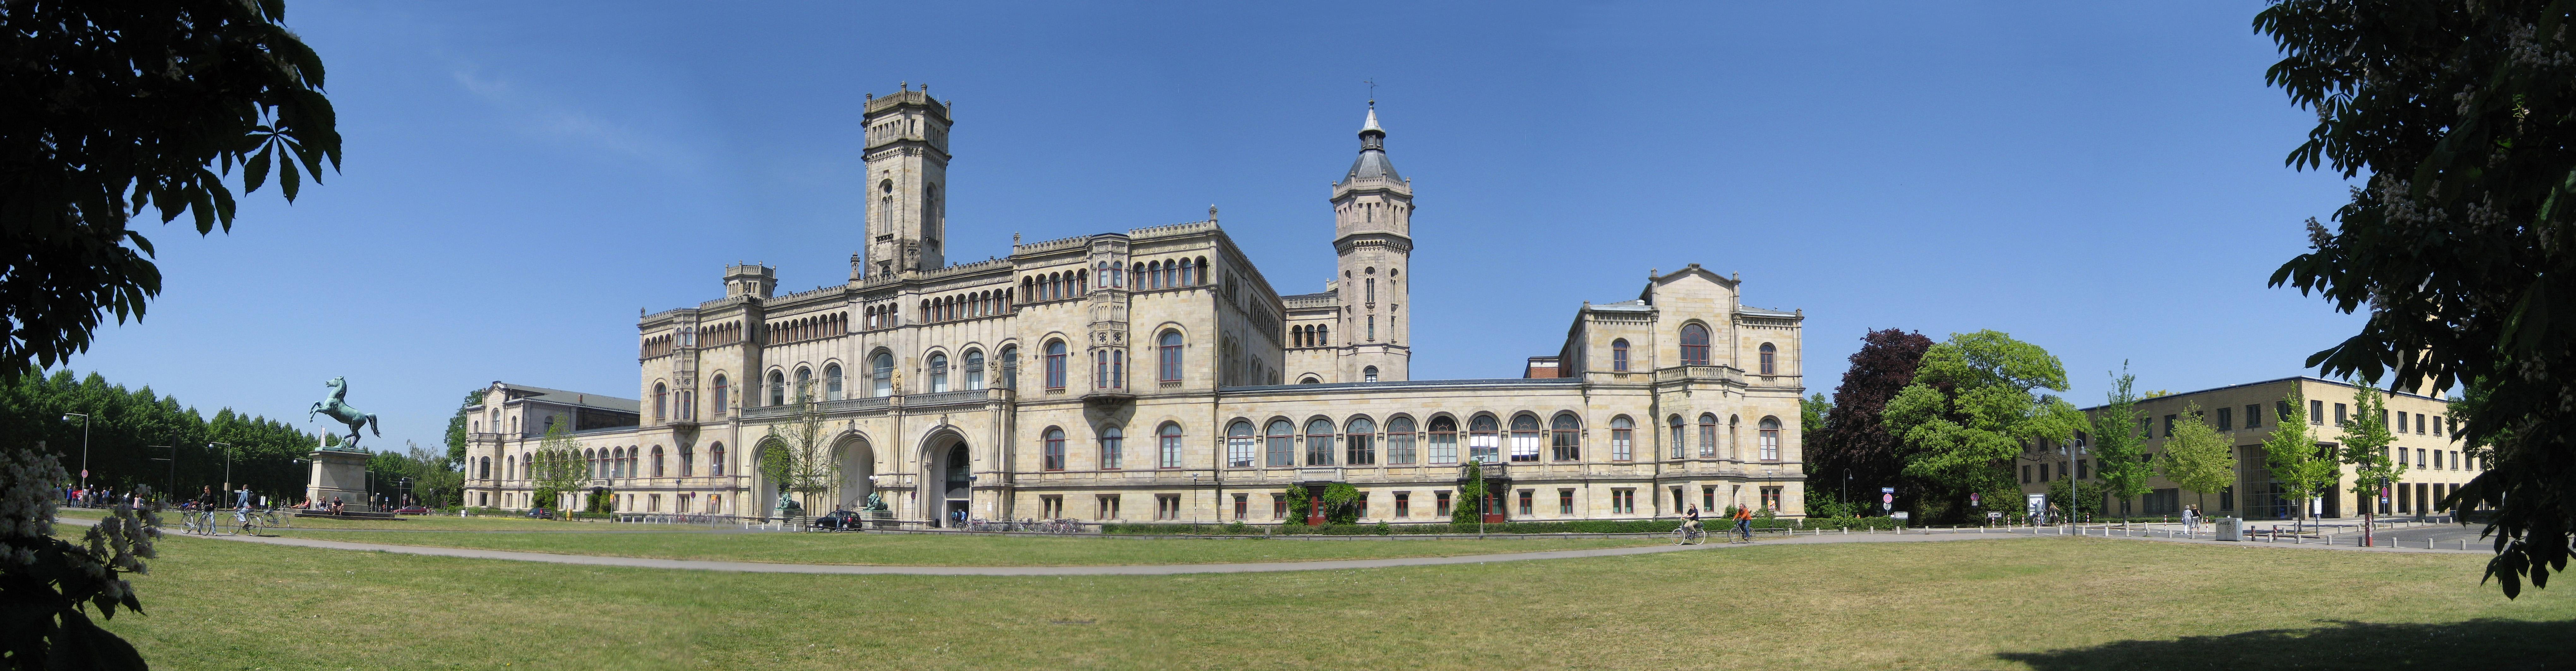 Description universität hannover hauptgebäude b